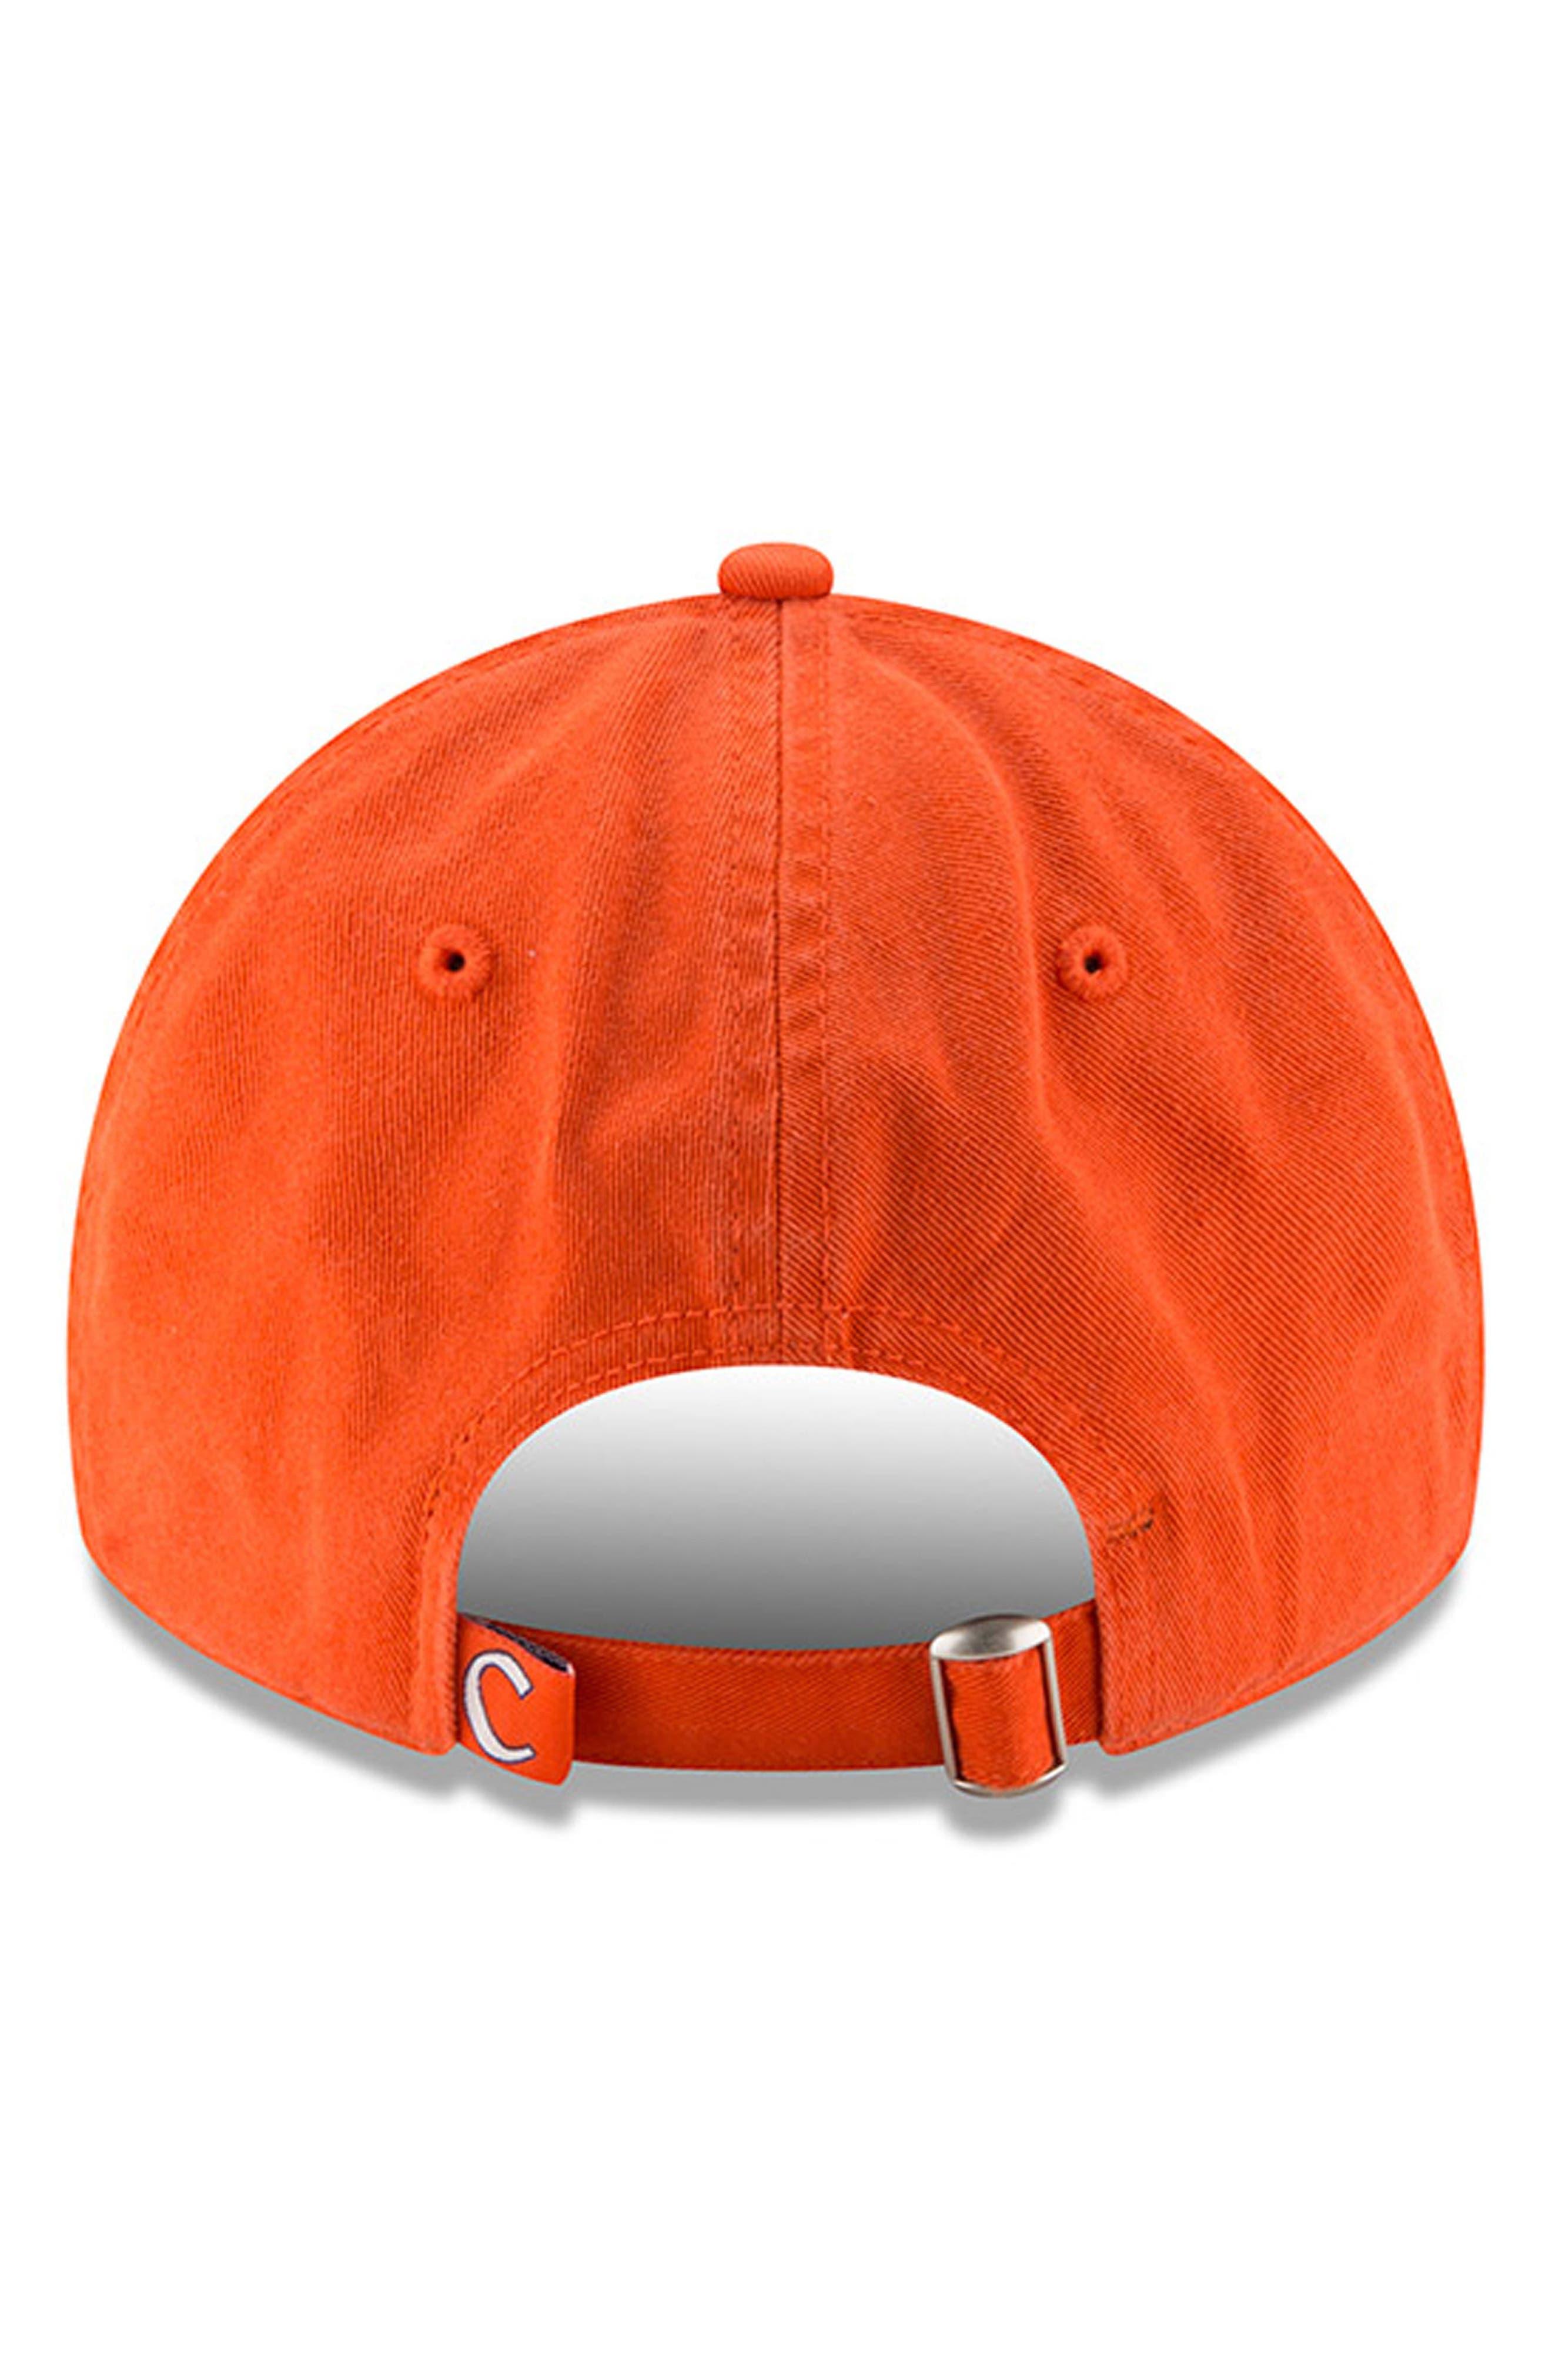 Alternate Image 2  - New Era Collegiate Core Classic - Clemson Tigers Baseball Cap